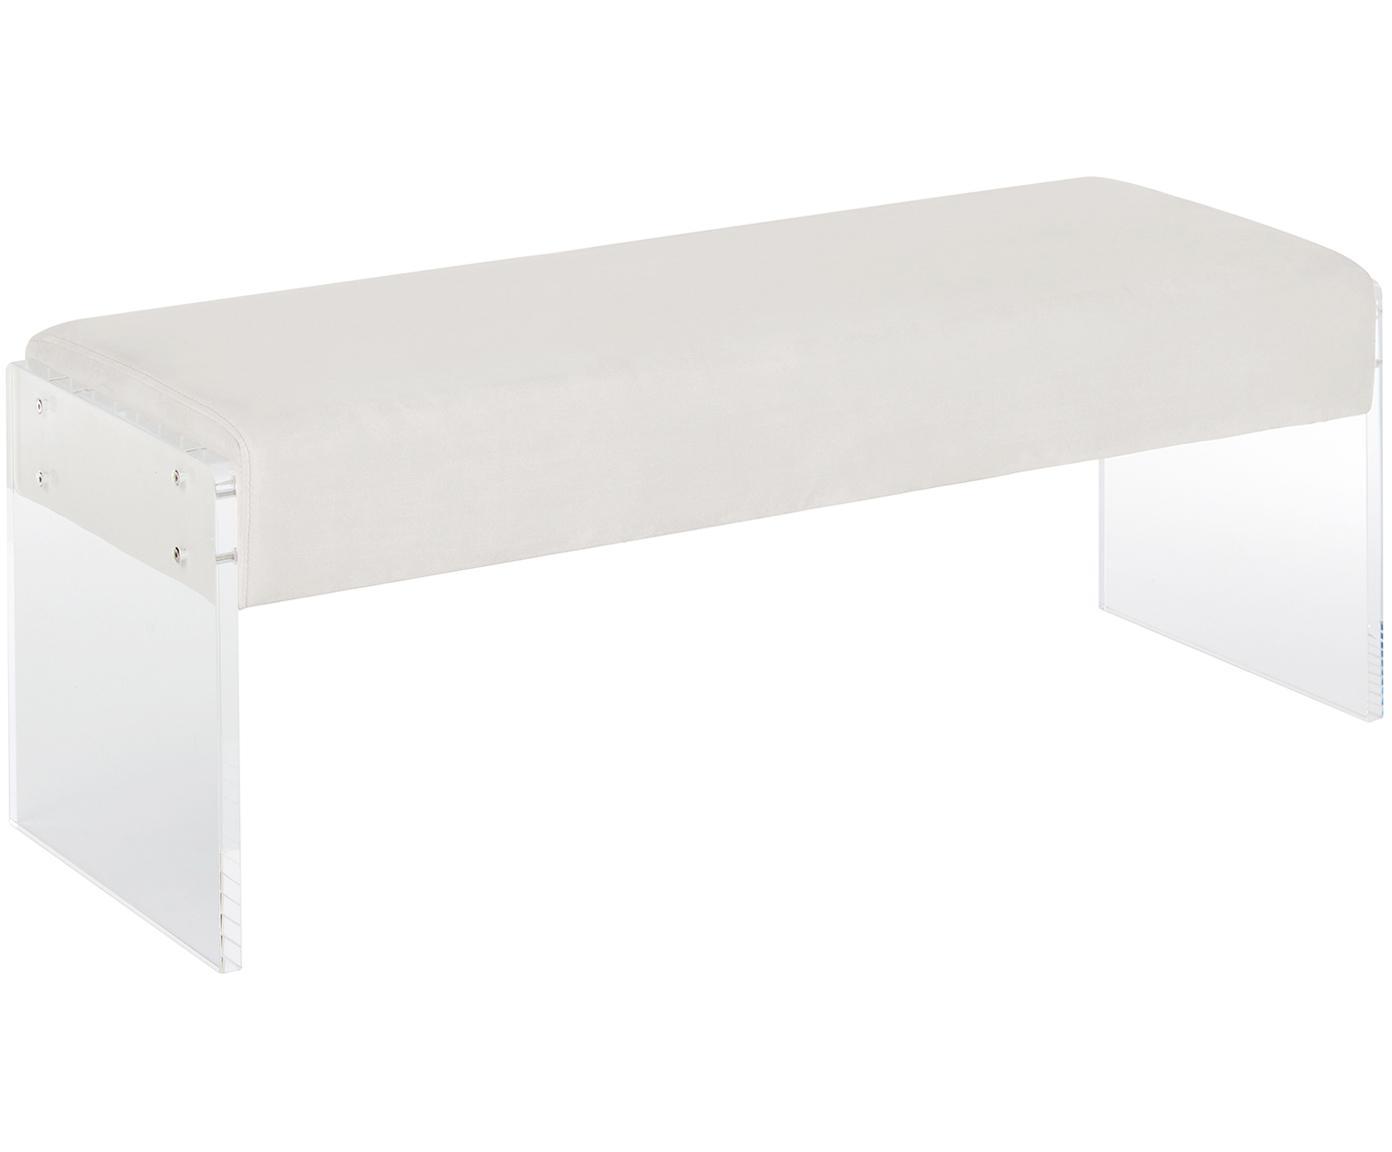 Fluwelen bank Ayden, Bekleding: fluweel (polyester), Frame: massief populierenhout, m, Poten: acrylglas, Bekleding: beige. Frame: transparant, 116 x 43 cm